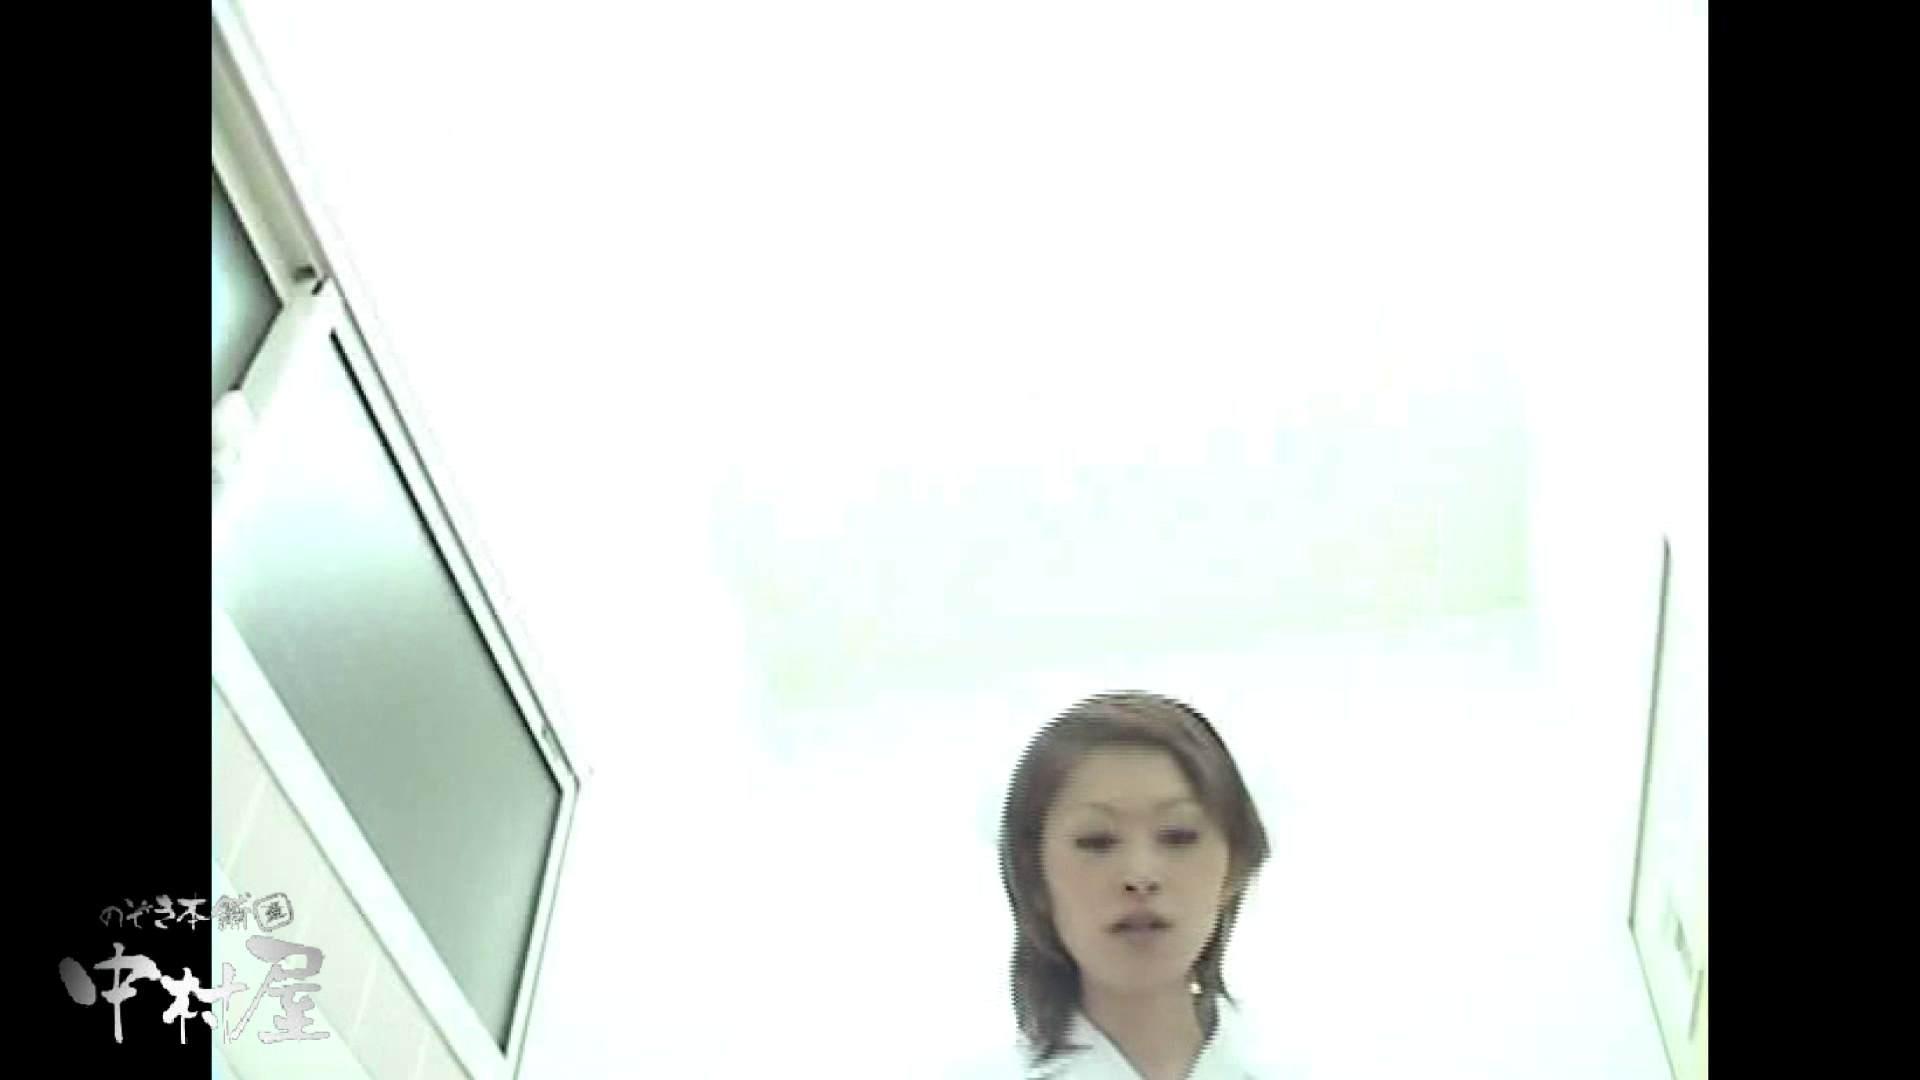 VIP配信している都内某大学病院編 和式イ更所盗撮 一部公開‼ トイレ   女医ヌード動画  100画像 67